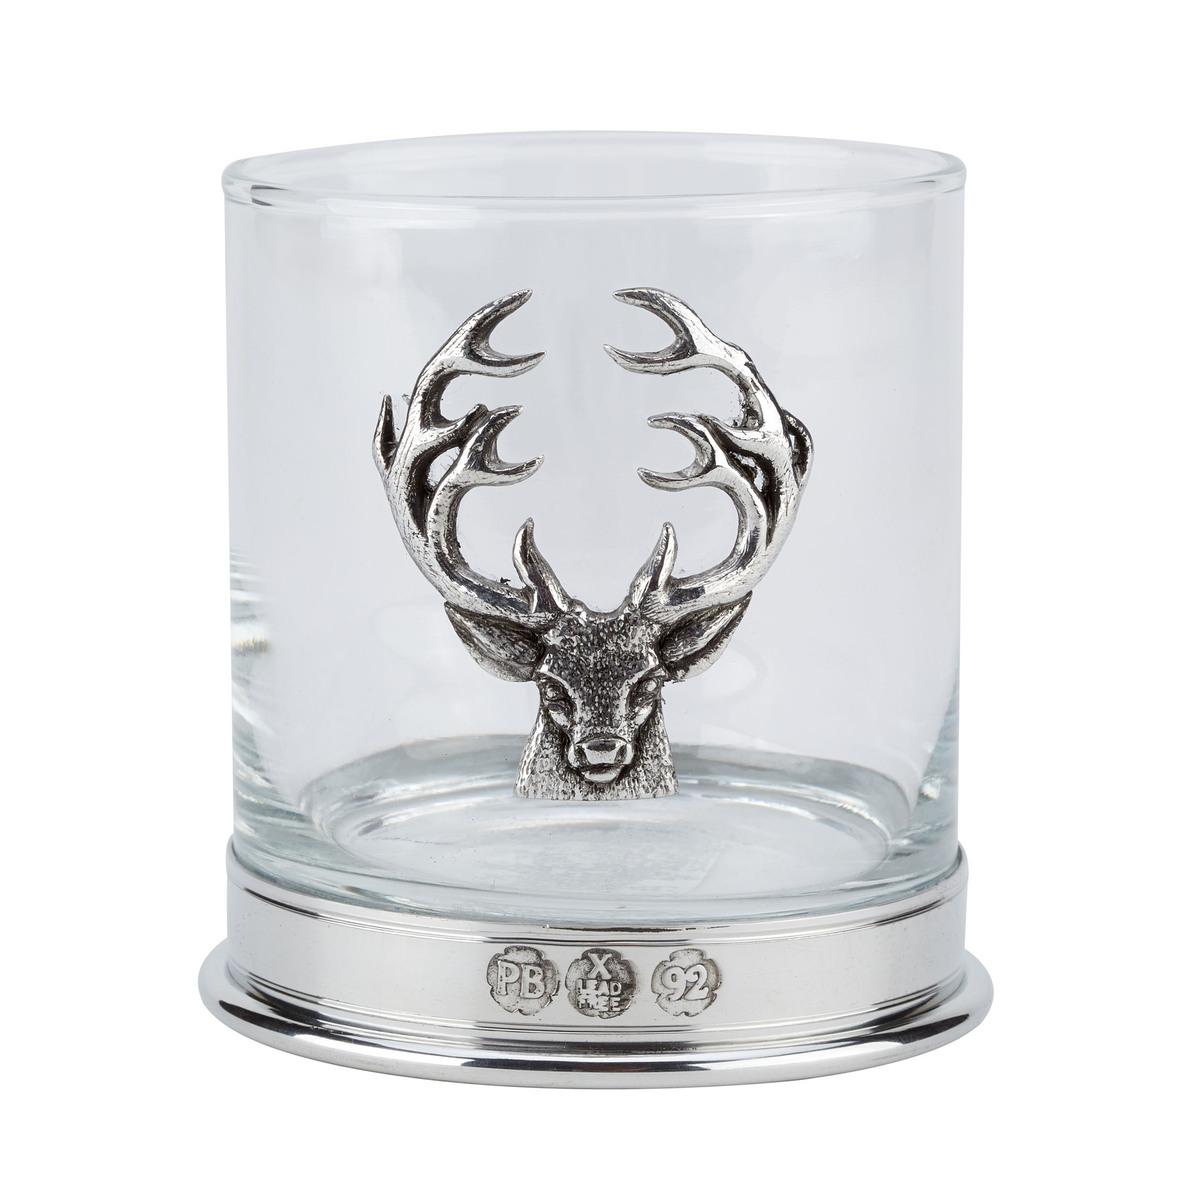 Stag Whisky Glasses - Pair